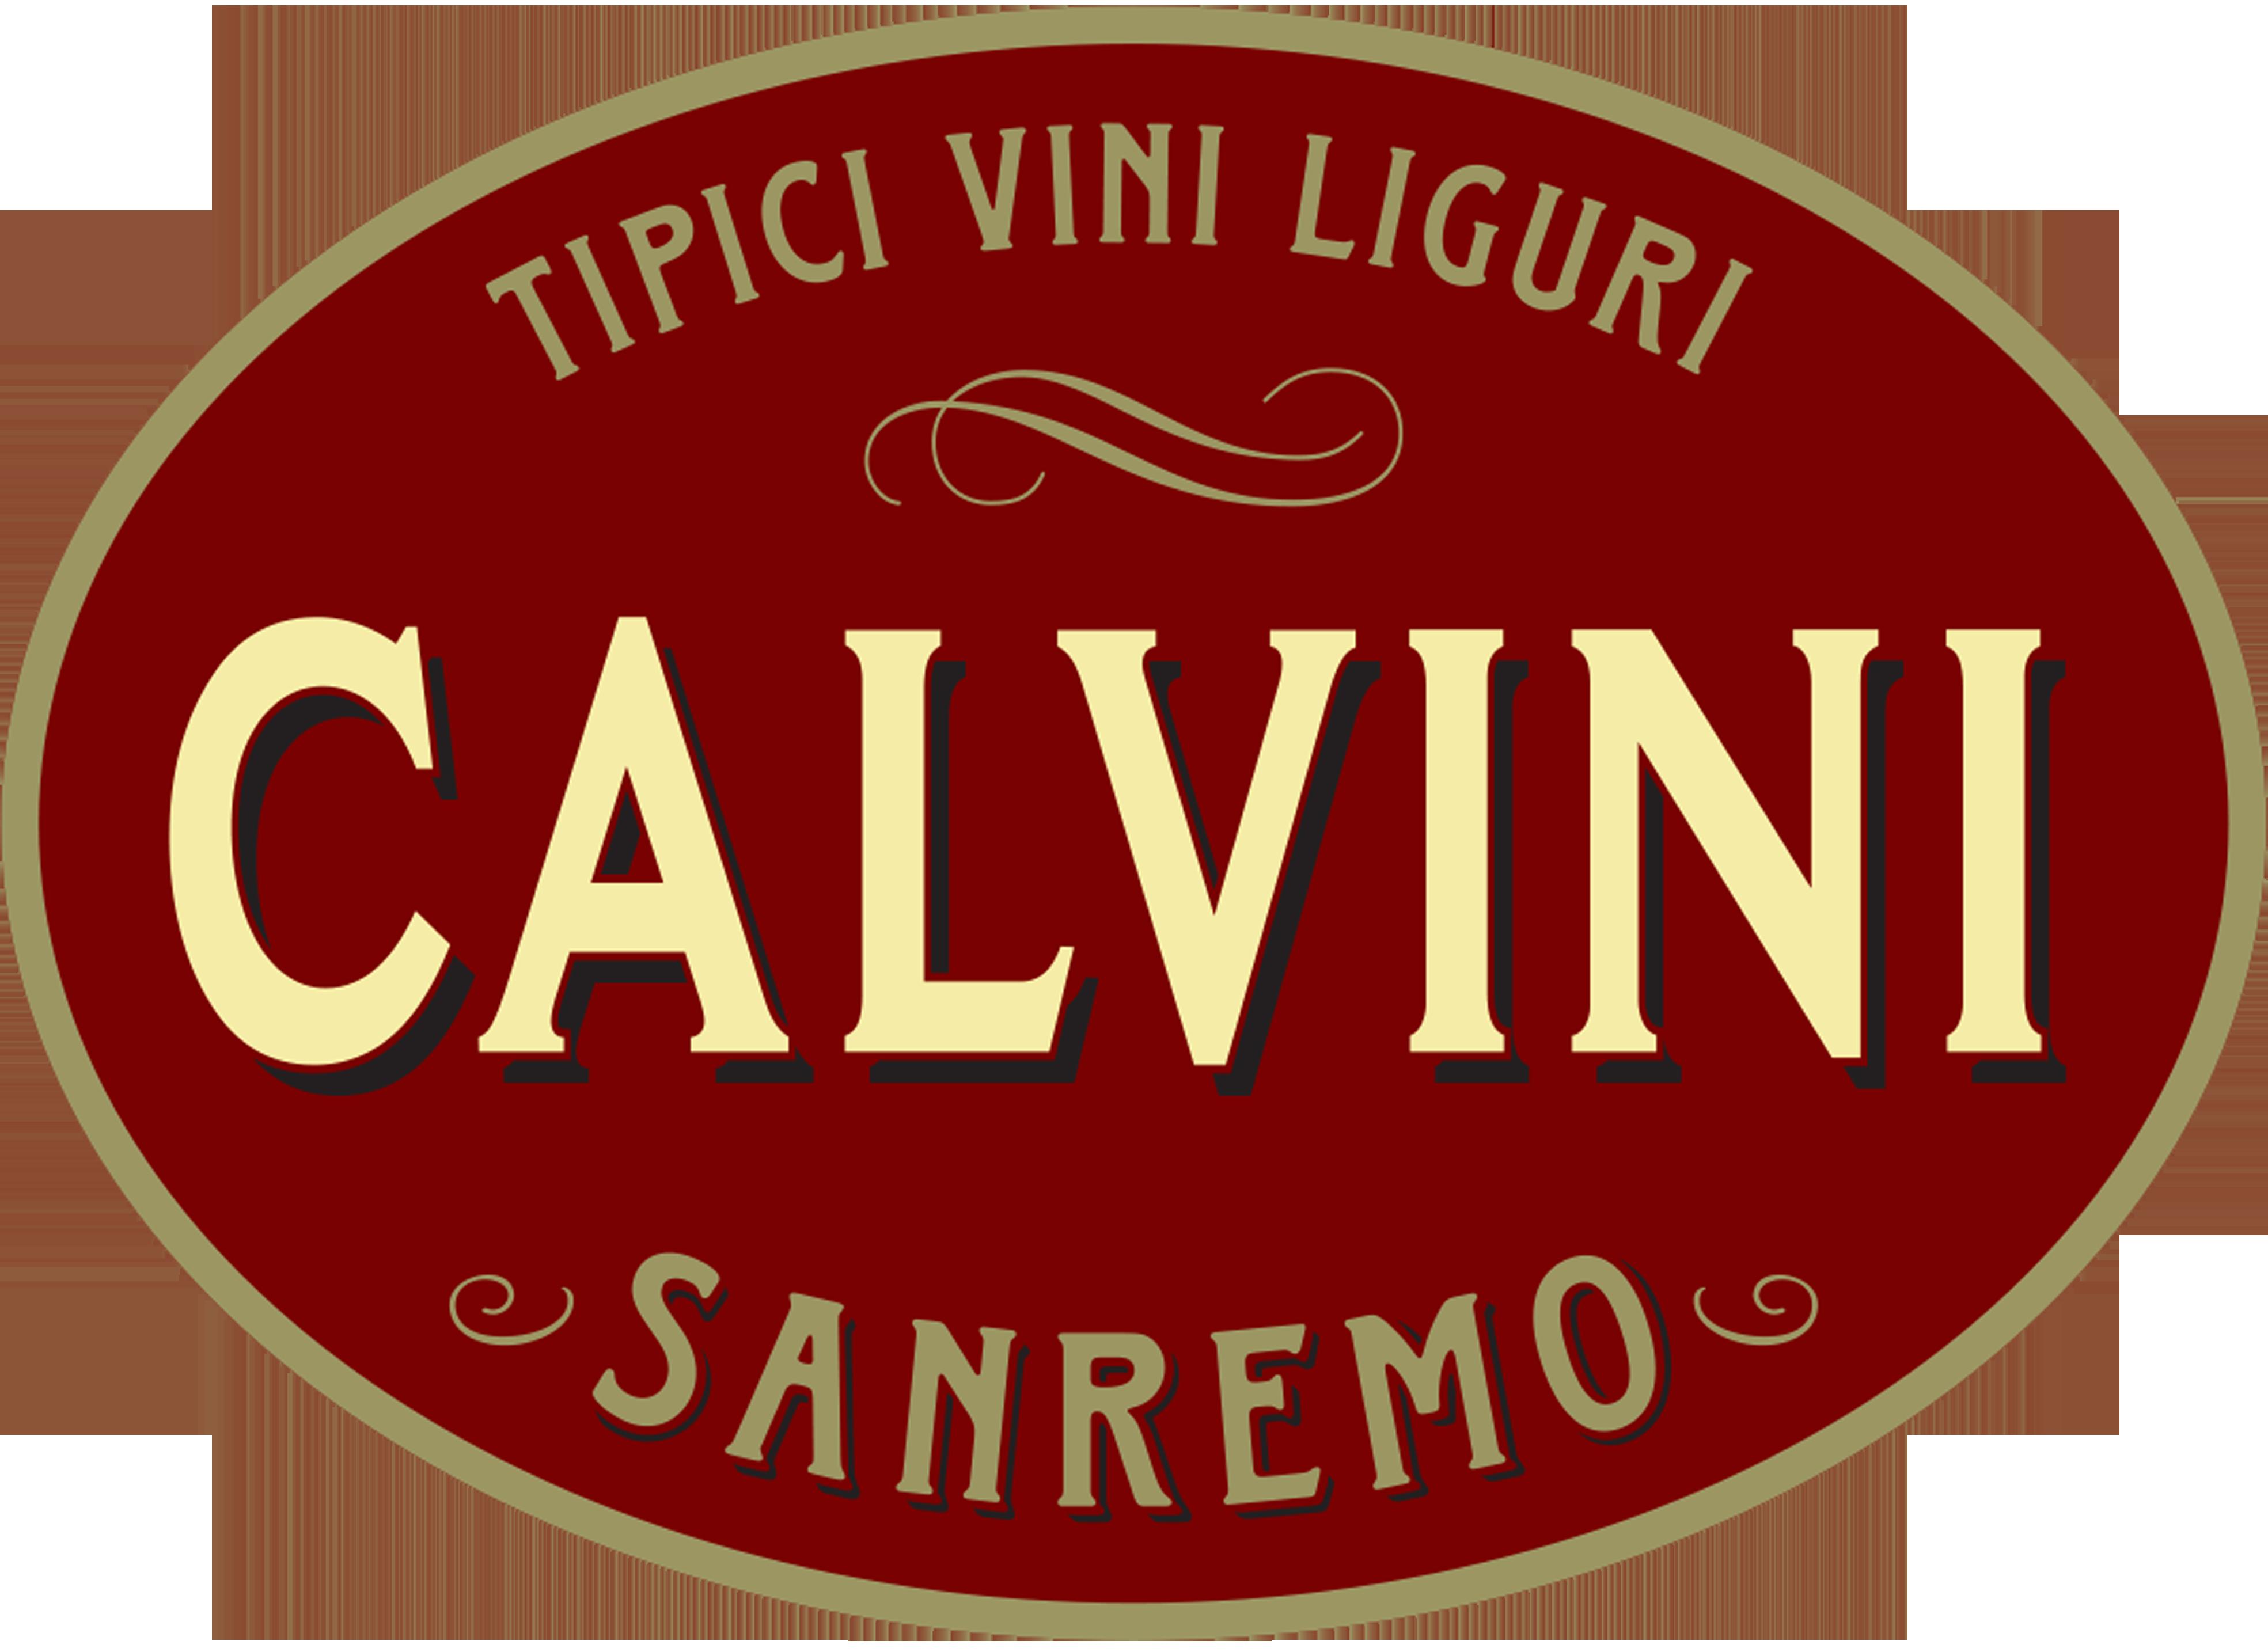 Calvini - Vini tipici